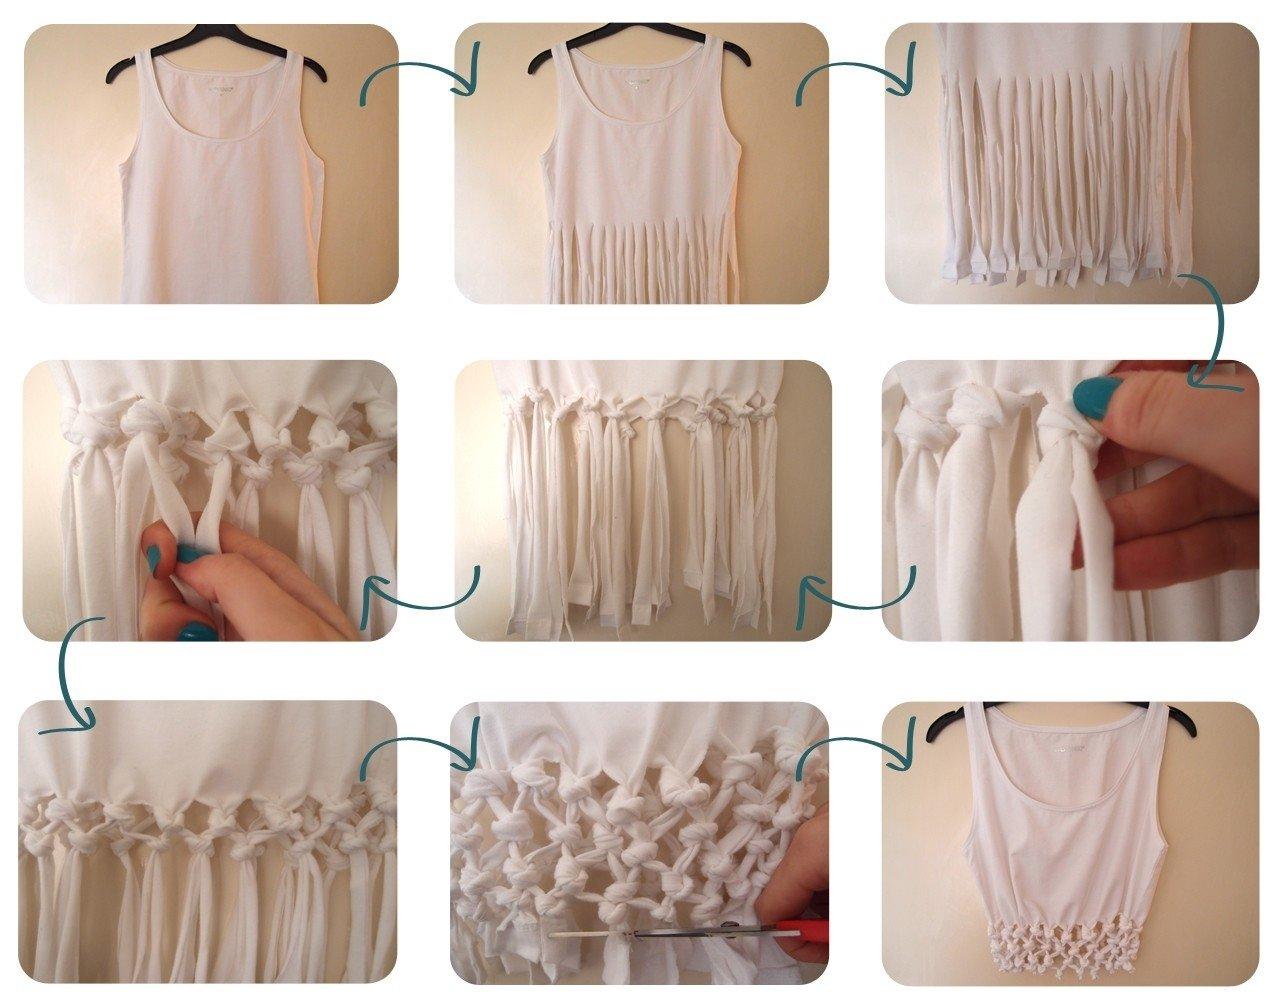 10 Attractive Cool T Shirt Cutting Ideas t shirt cutting designs ideas diy shirt diy clothes pinterest 2021